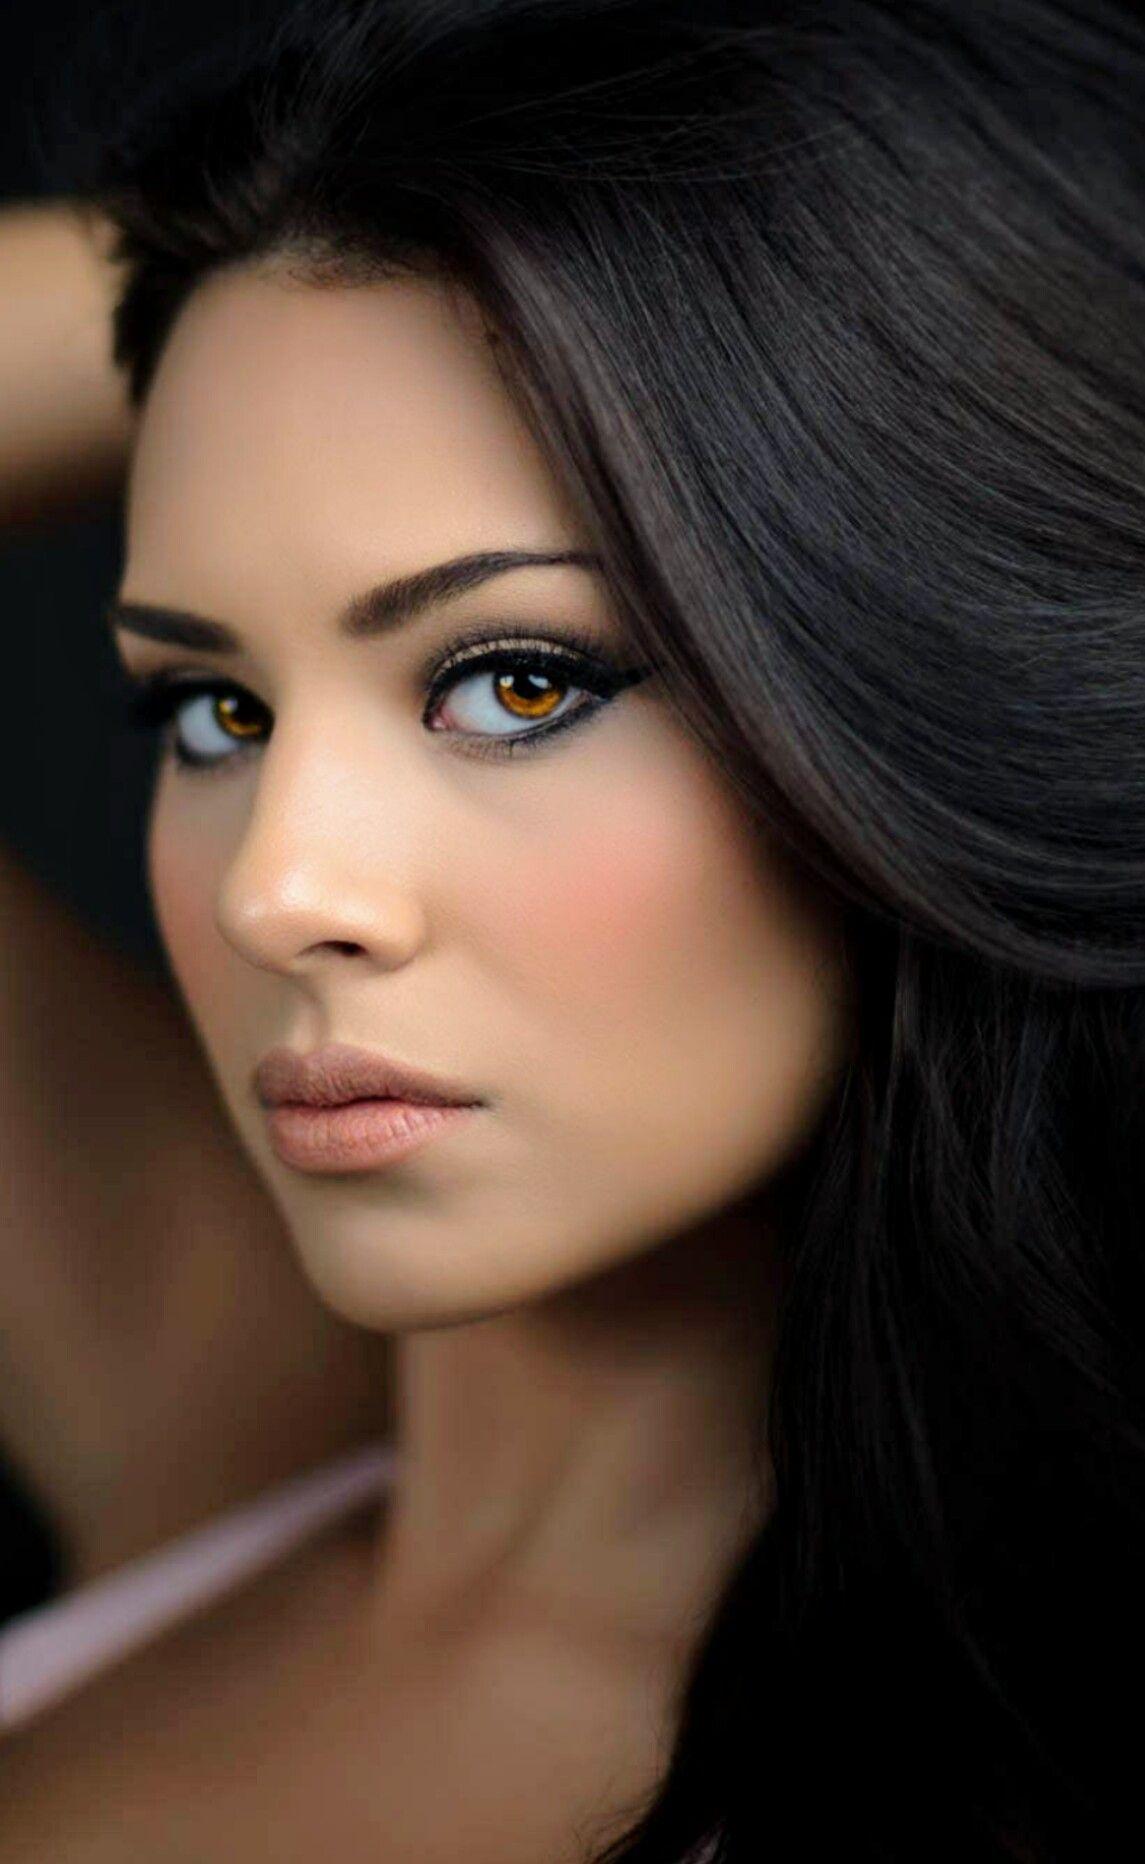 Pin by stephanie roberts on feminine beauty pinterest eye